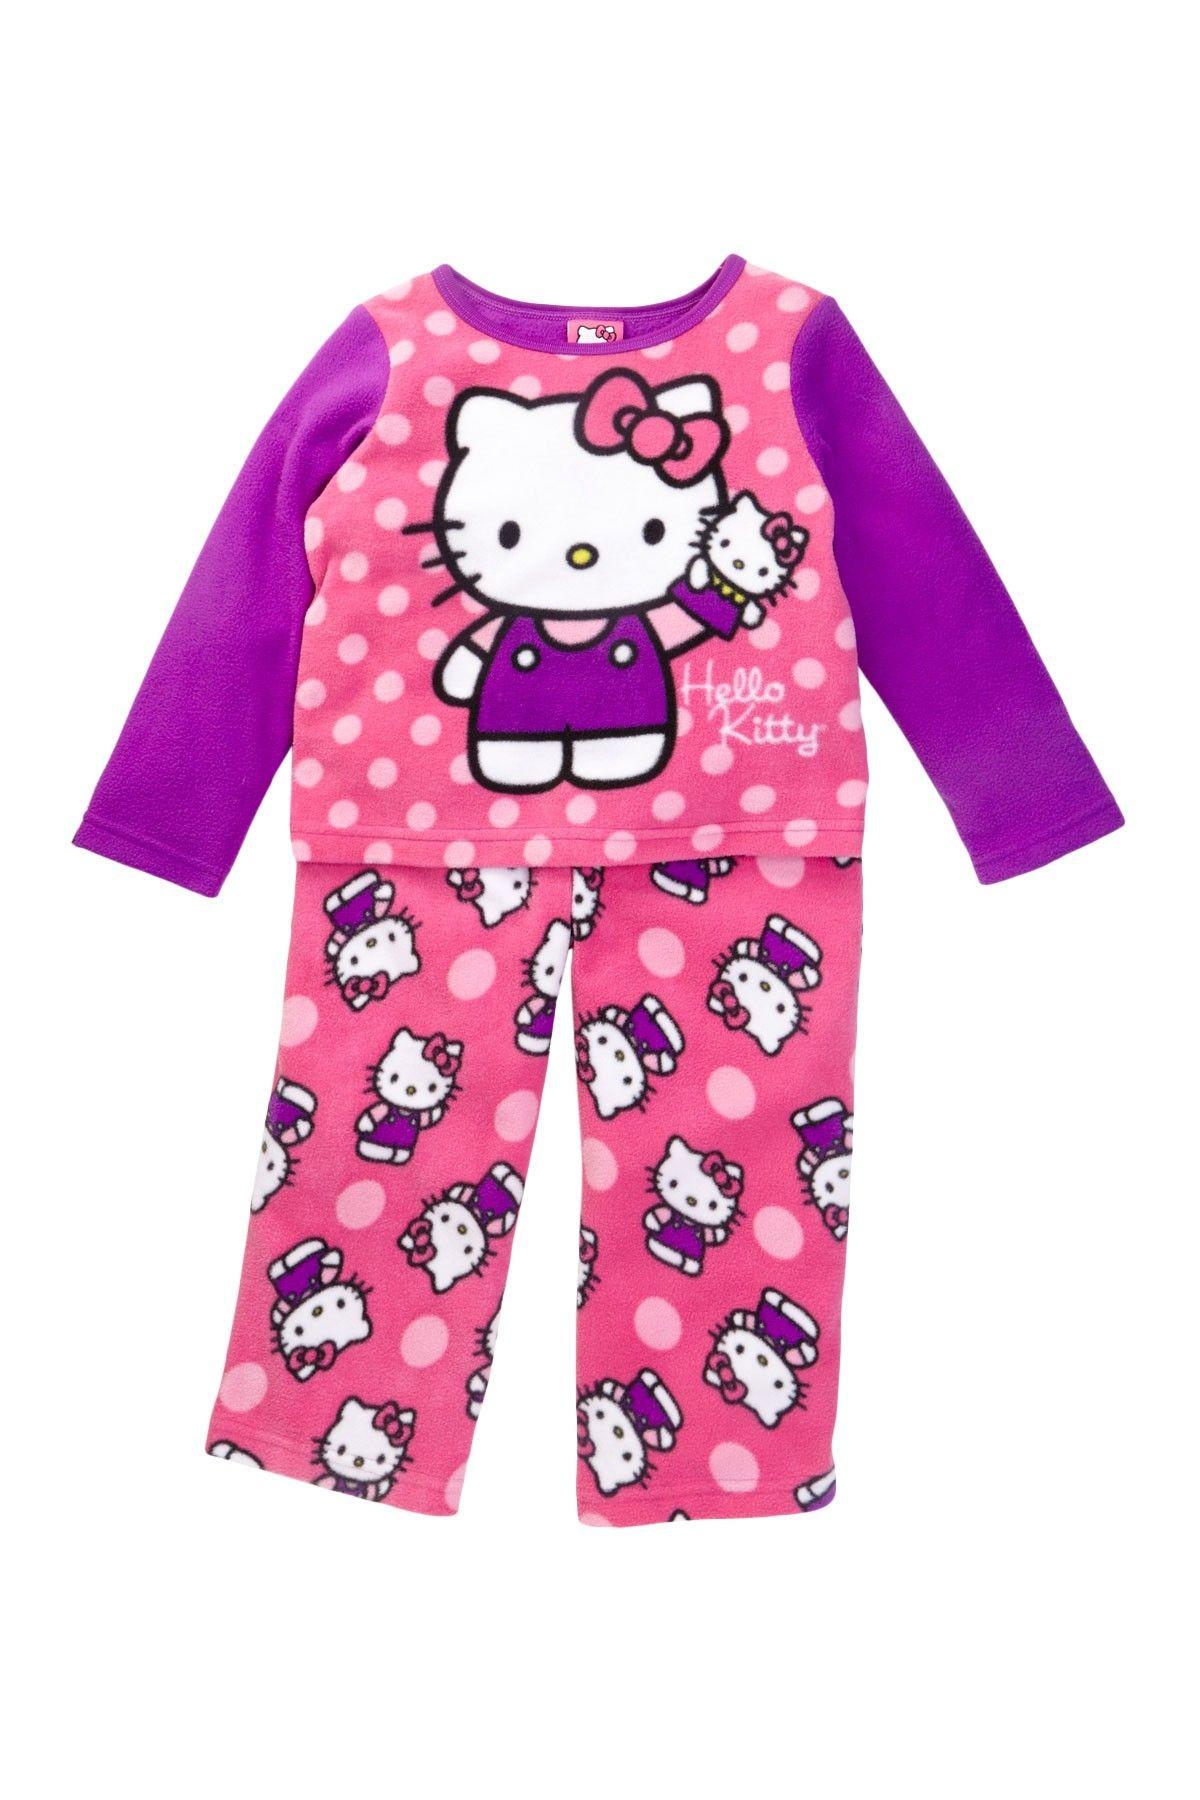 Hello Kitty Fleece Pj Set Toddler Girls Kids With